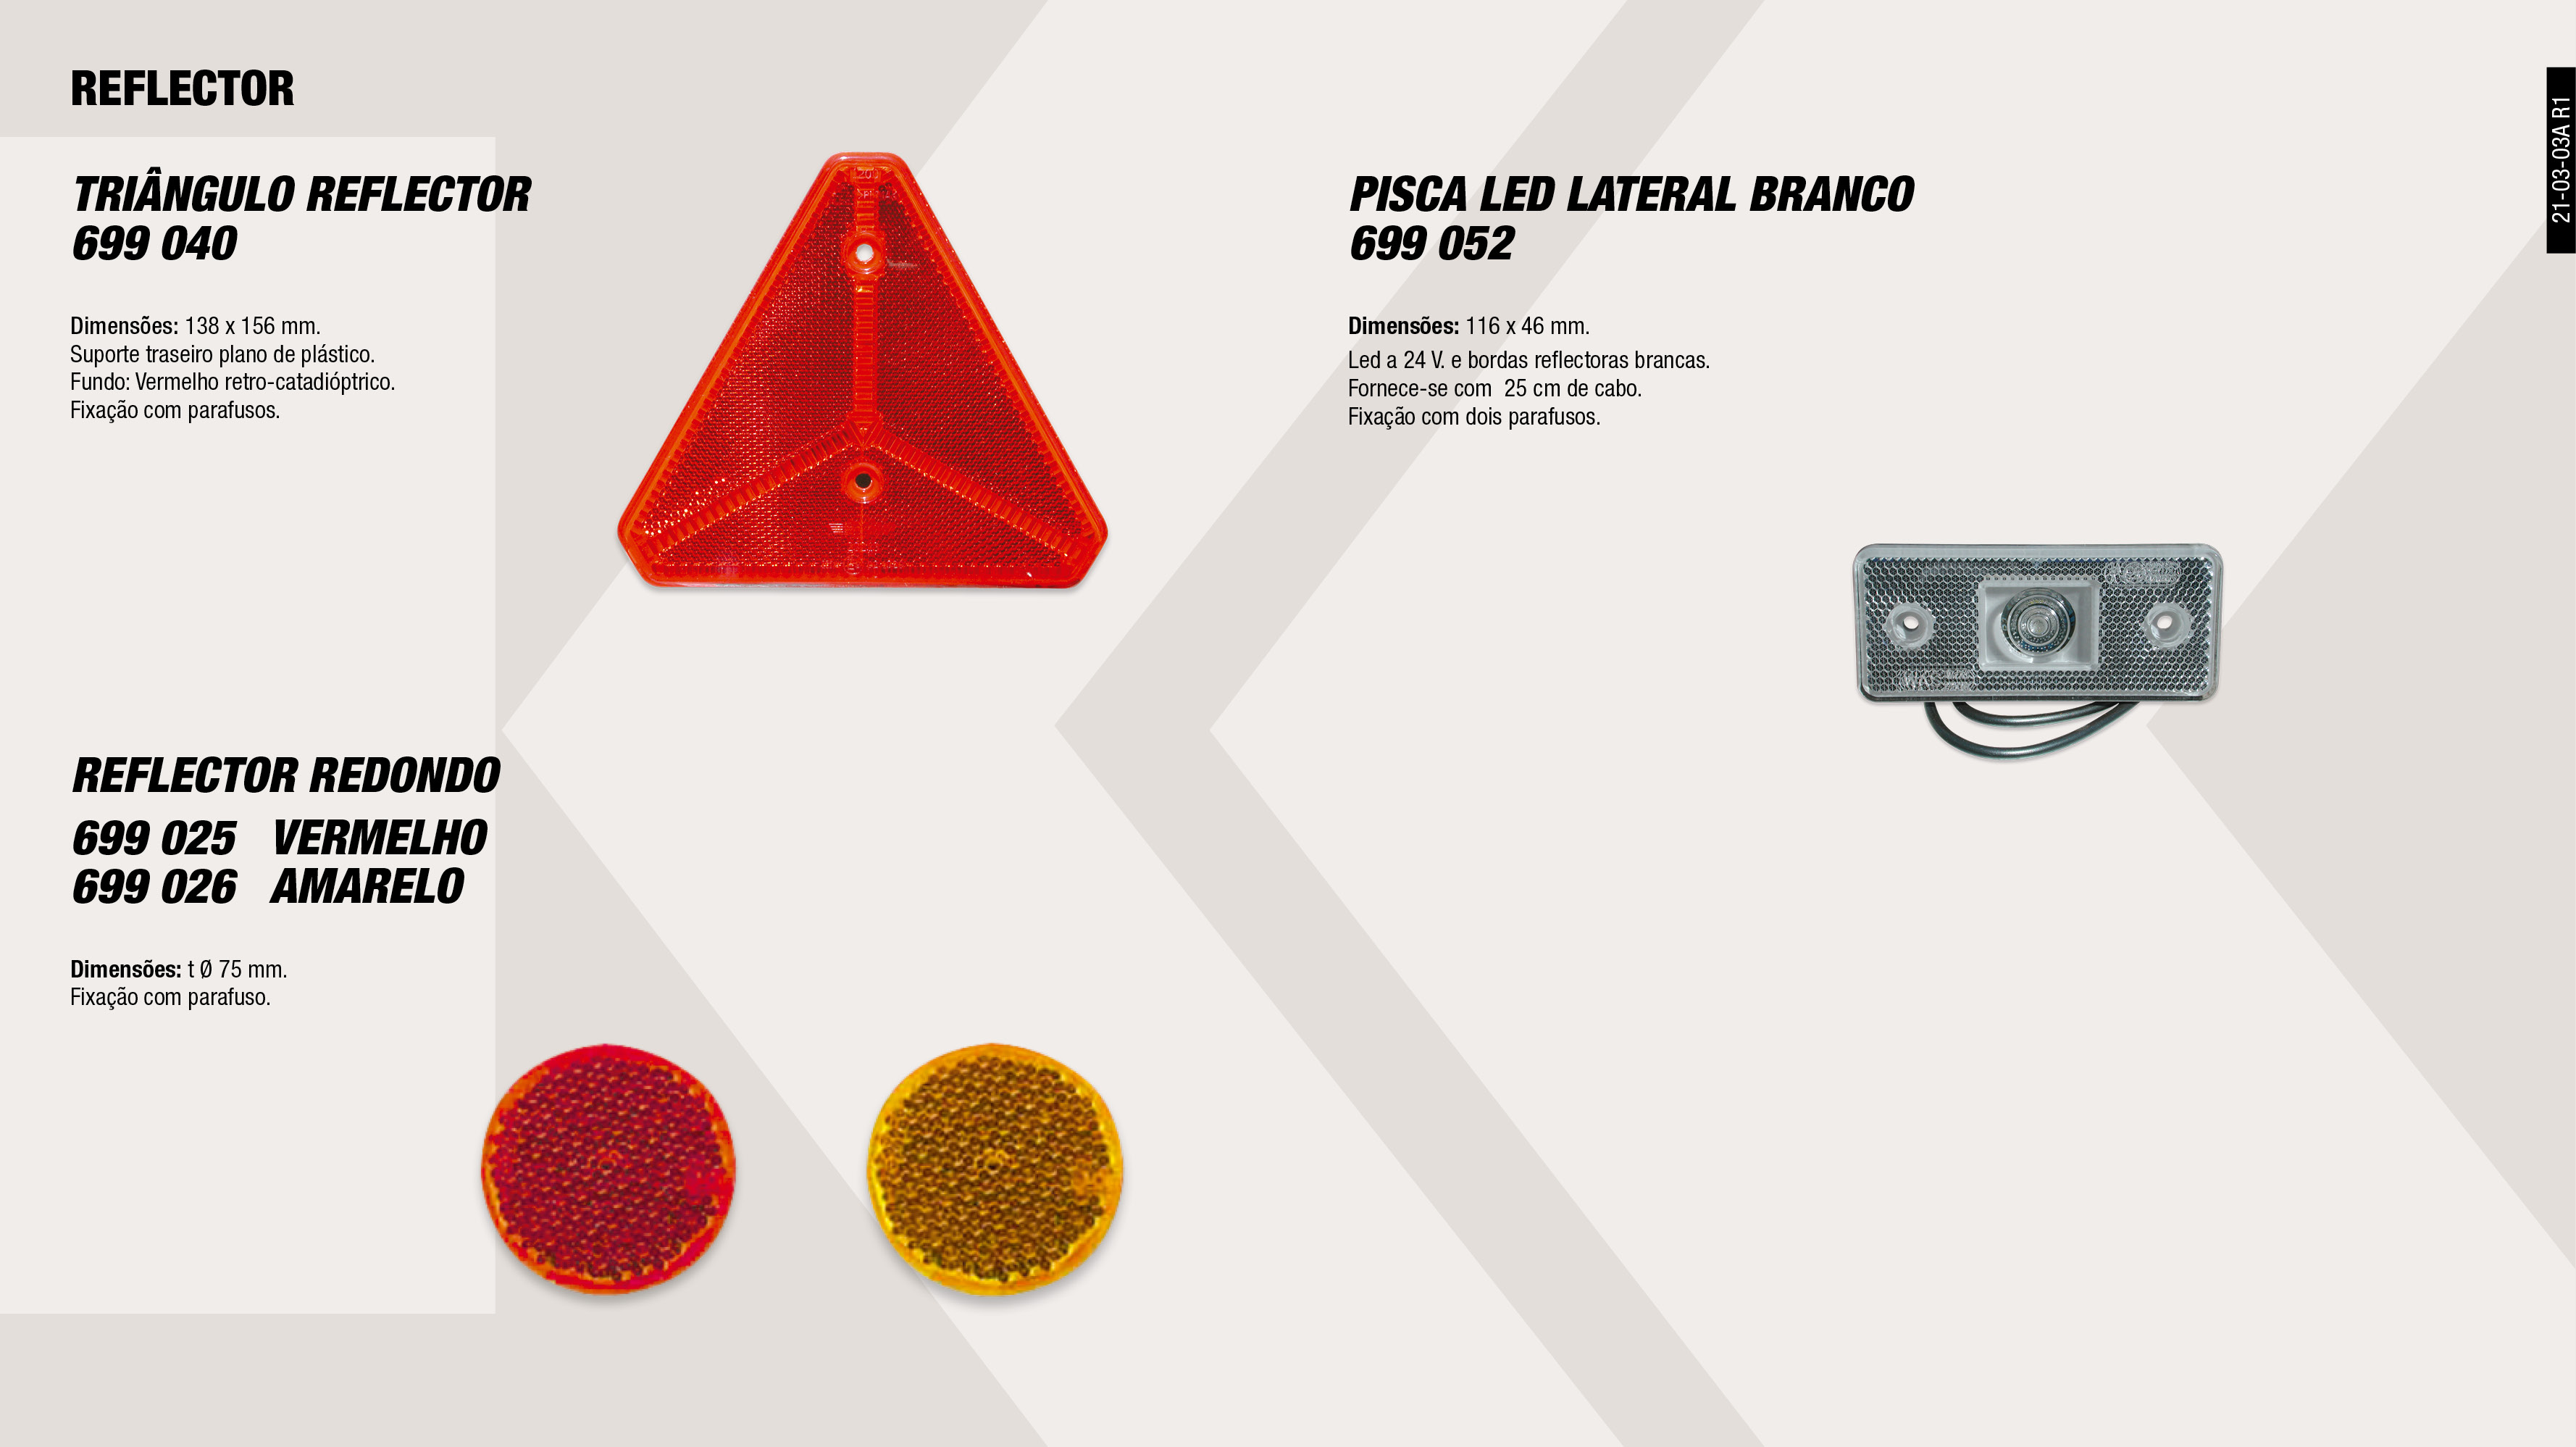 REFLECTOR REDONDO AMARELO                                   ,  PISCA LED LATERAL BRANCO                                    ,  TRIANGULO REFLECTOR                                         ,  REFLECTOR REDONDO VERMELHO                                  ,